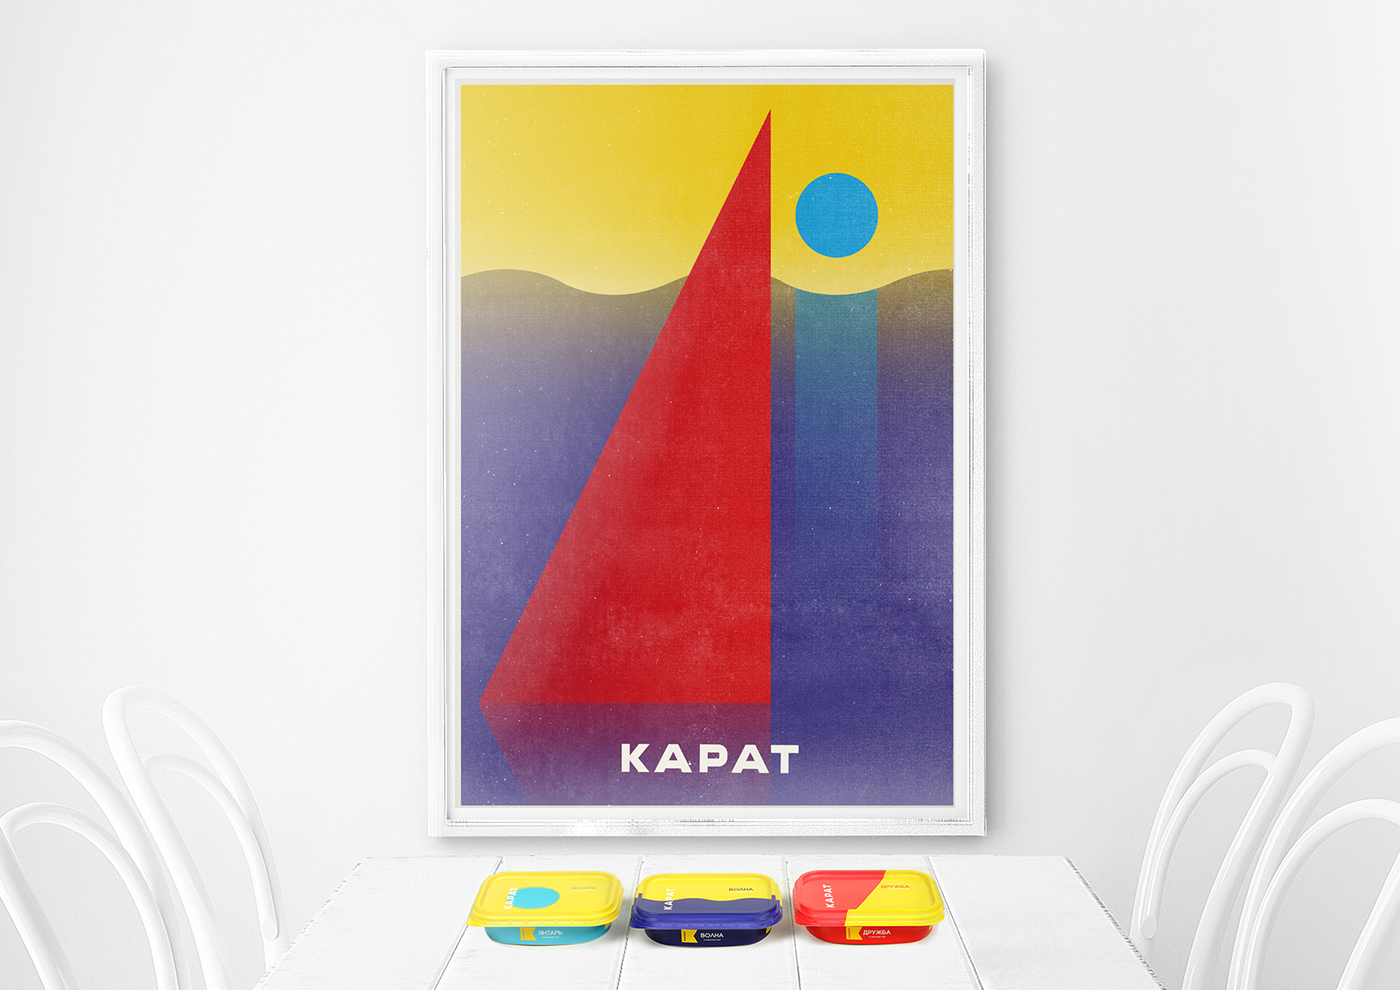 Cheese-Karat6